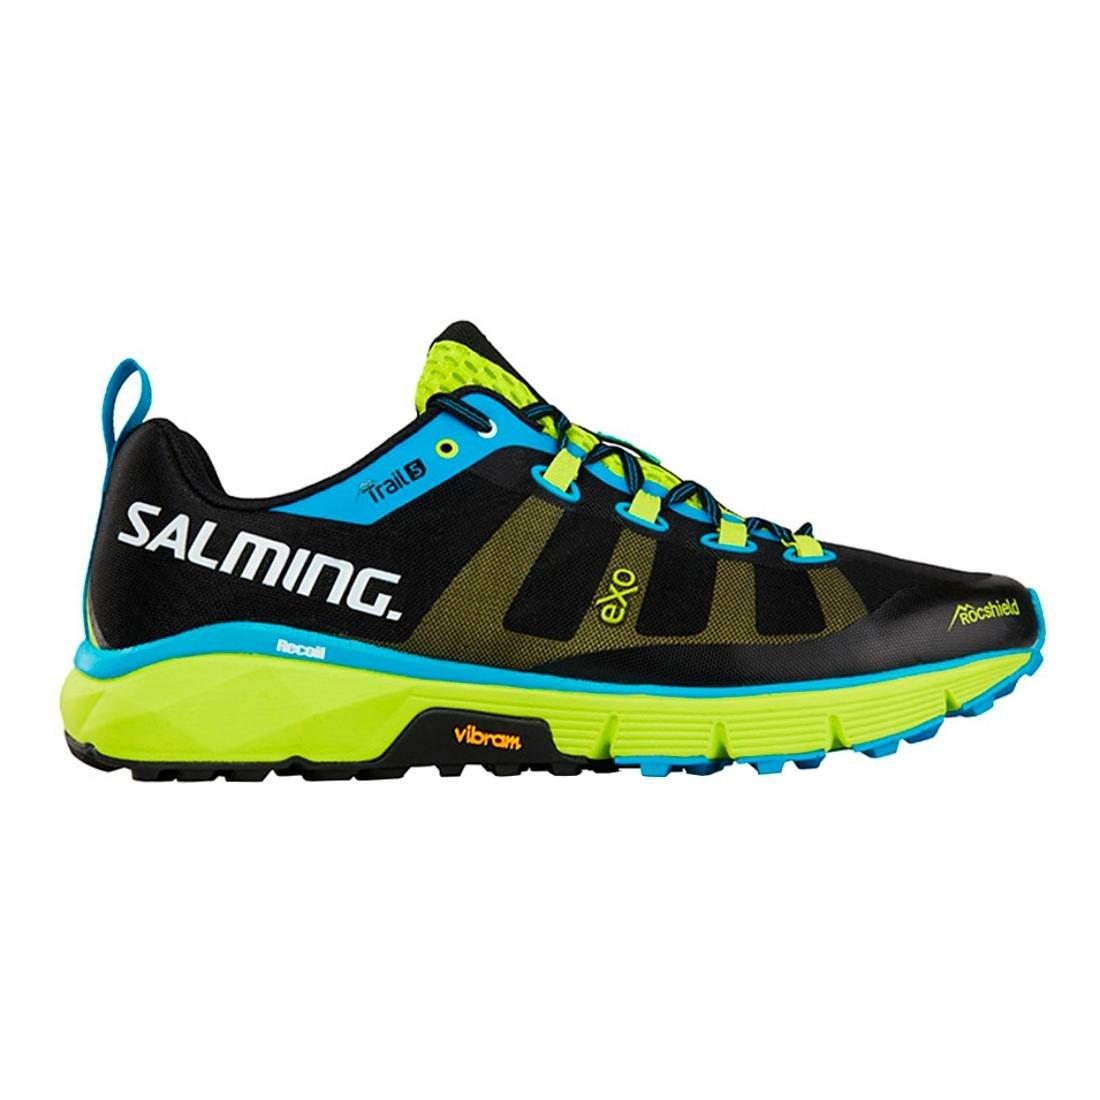 SalmingメンズTrail 5 B07541R9LT 12.5 D(M) US|ブラック/ライム ブラック/ライム 12.5 D(M) US